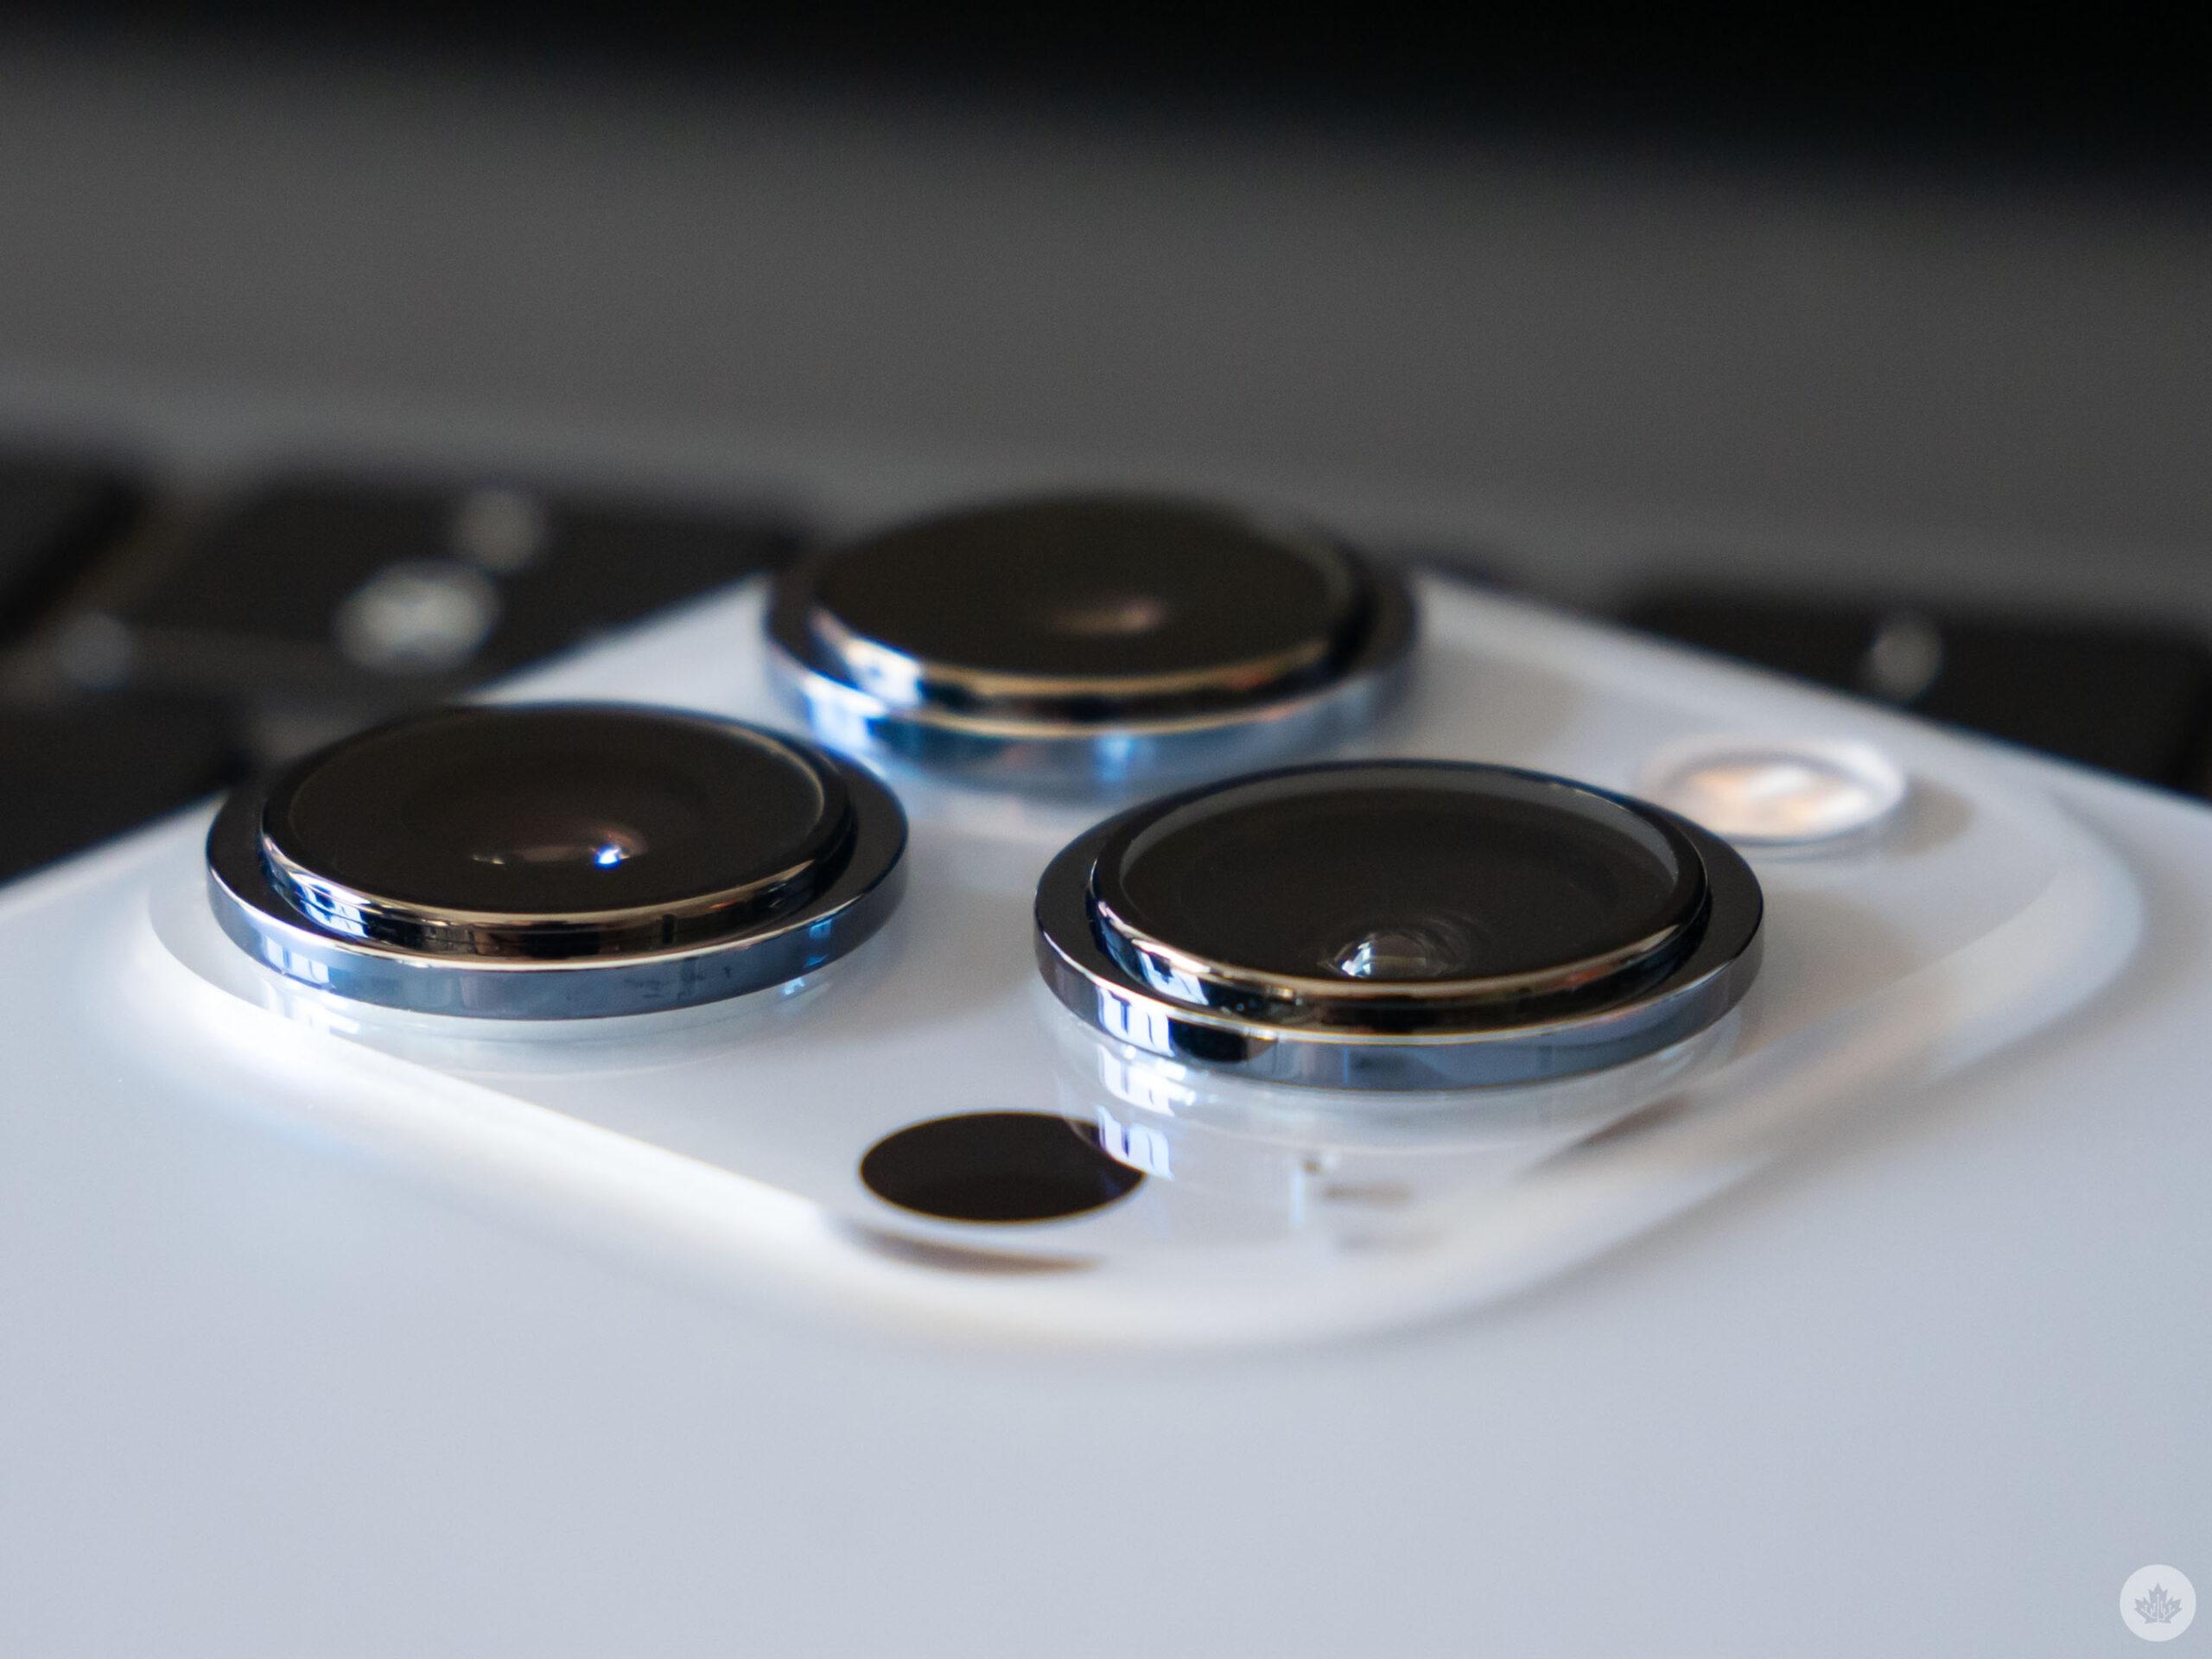 iPhone 13 Pro Max lens